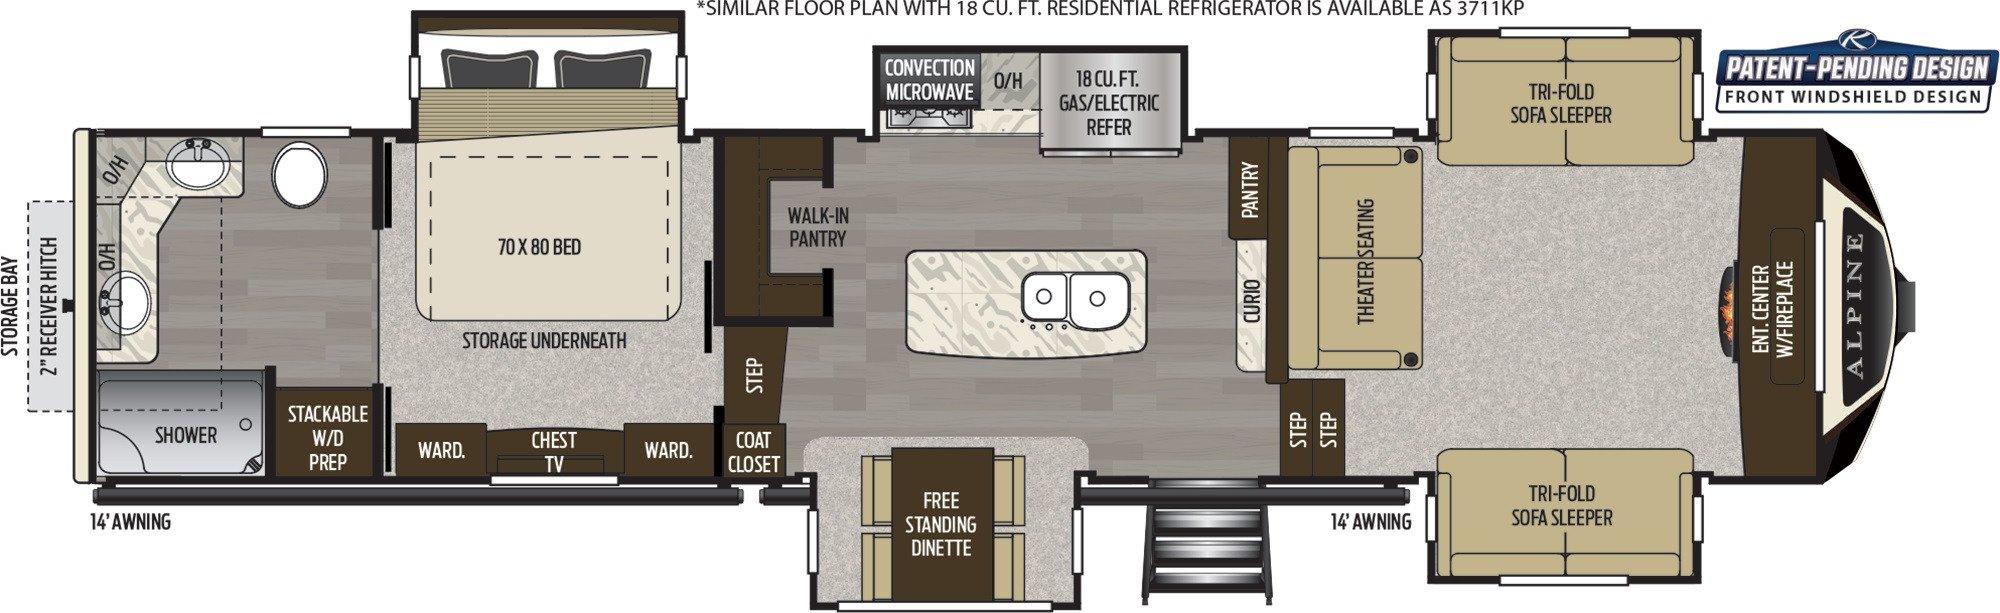 View Floor Plan for 2020 KEYSTONE ALPINE 3710KP